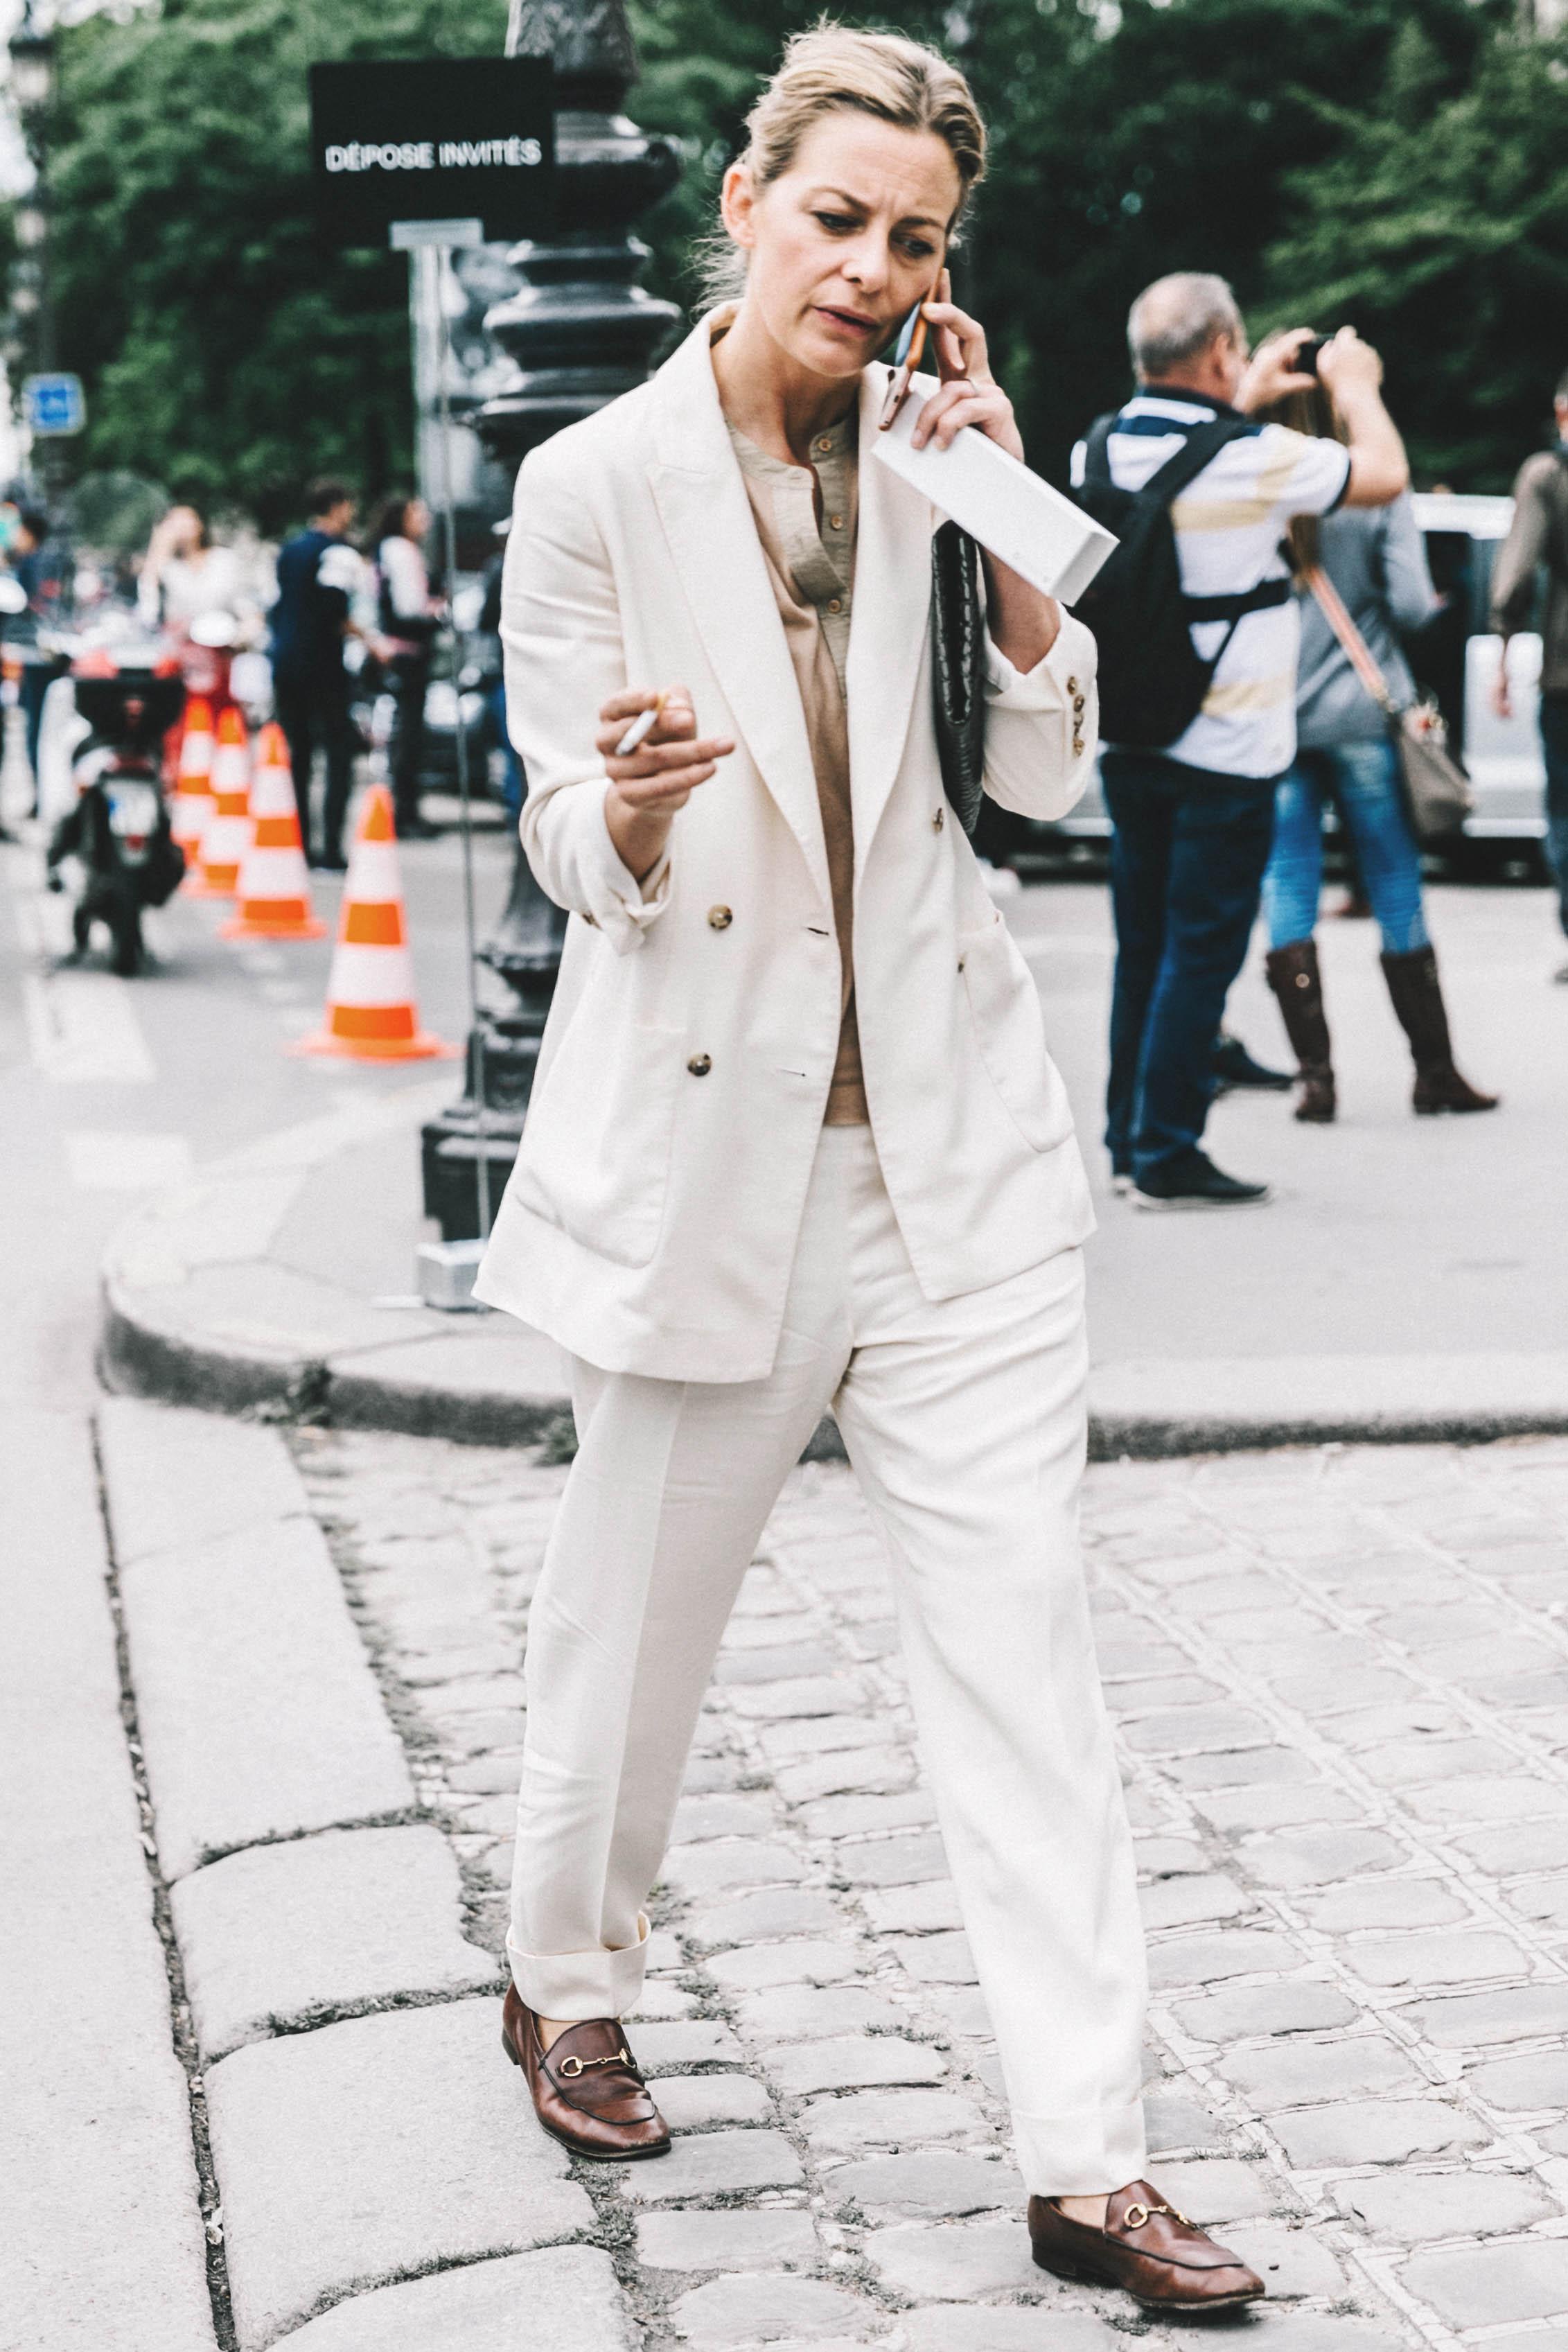 paris_couture_fashion_week-collage_vintage-110